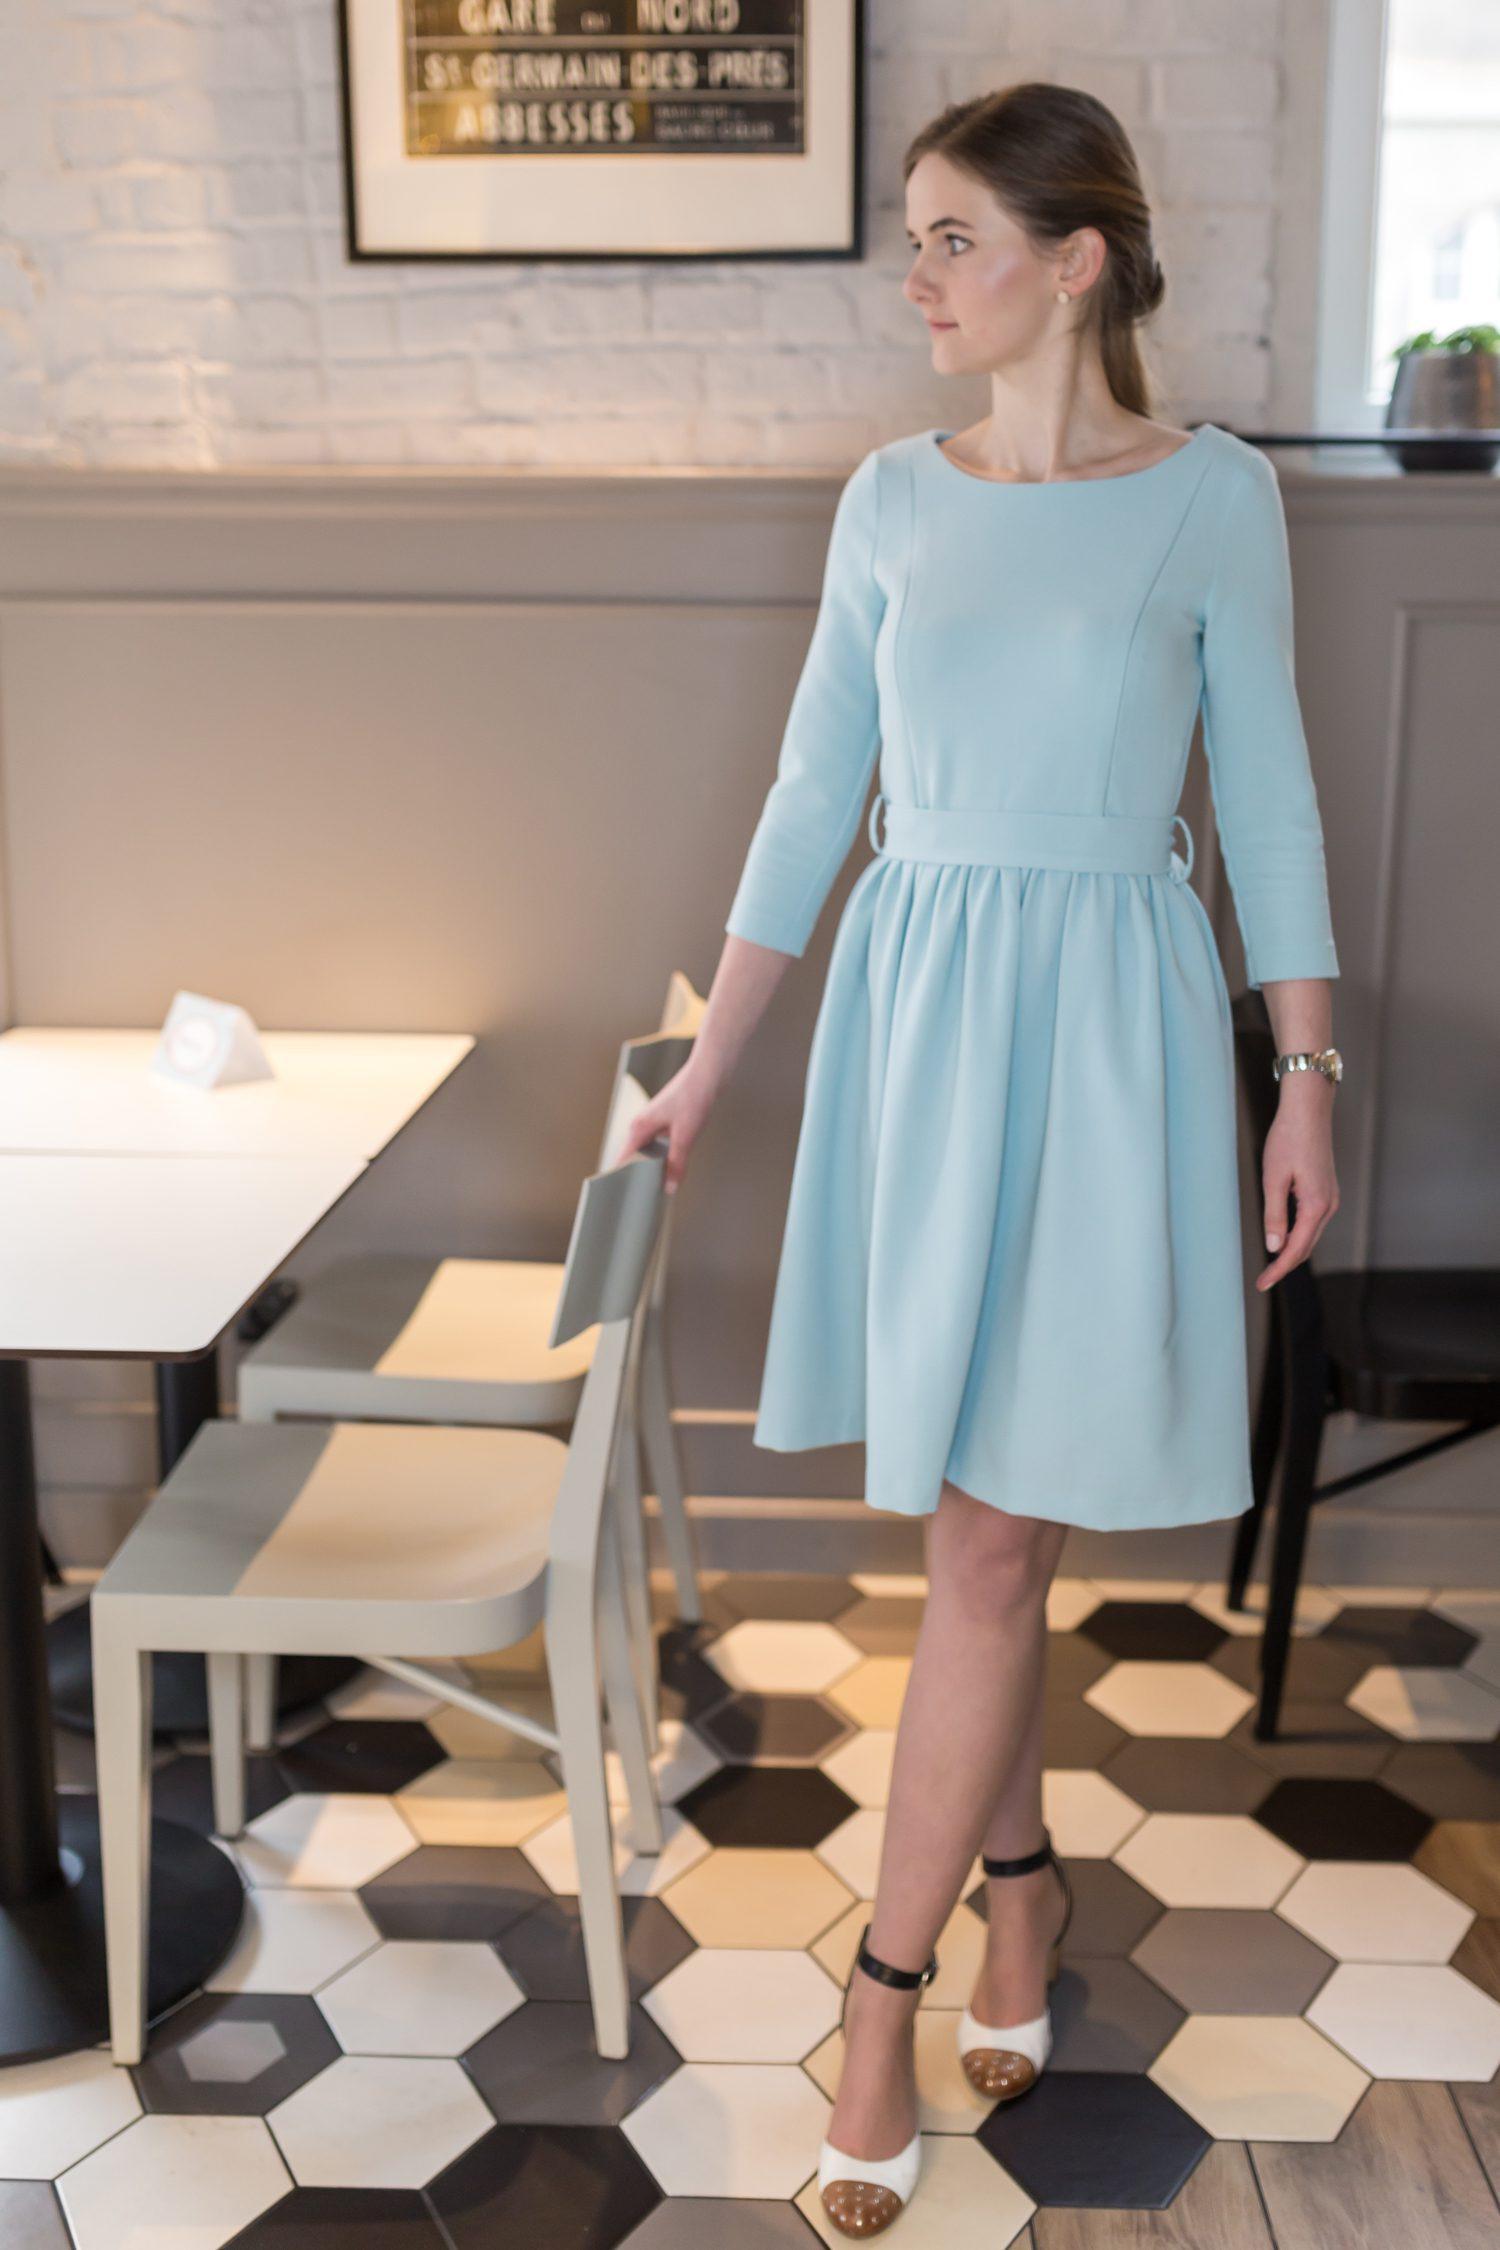 e130f7ba Sukienka do karmienia Frappe Coffee - Milook kobiece ubrania dla Mam